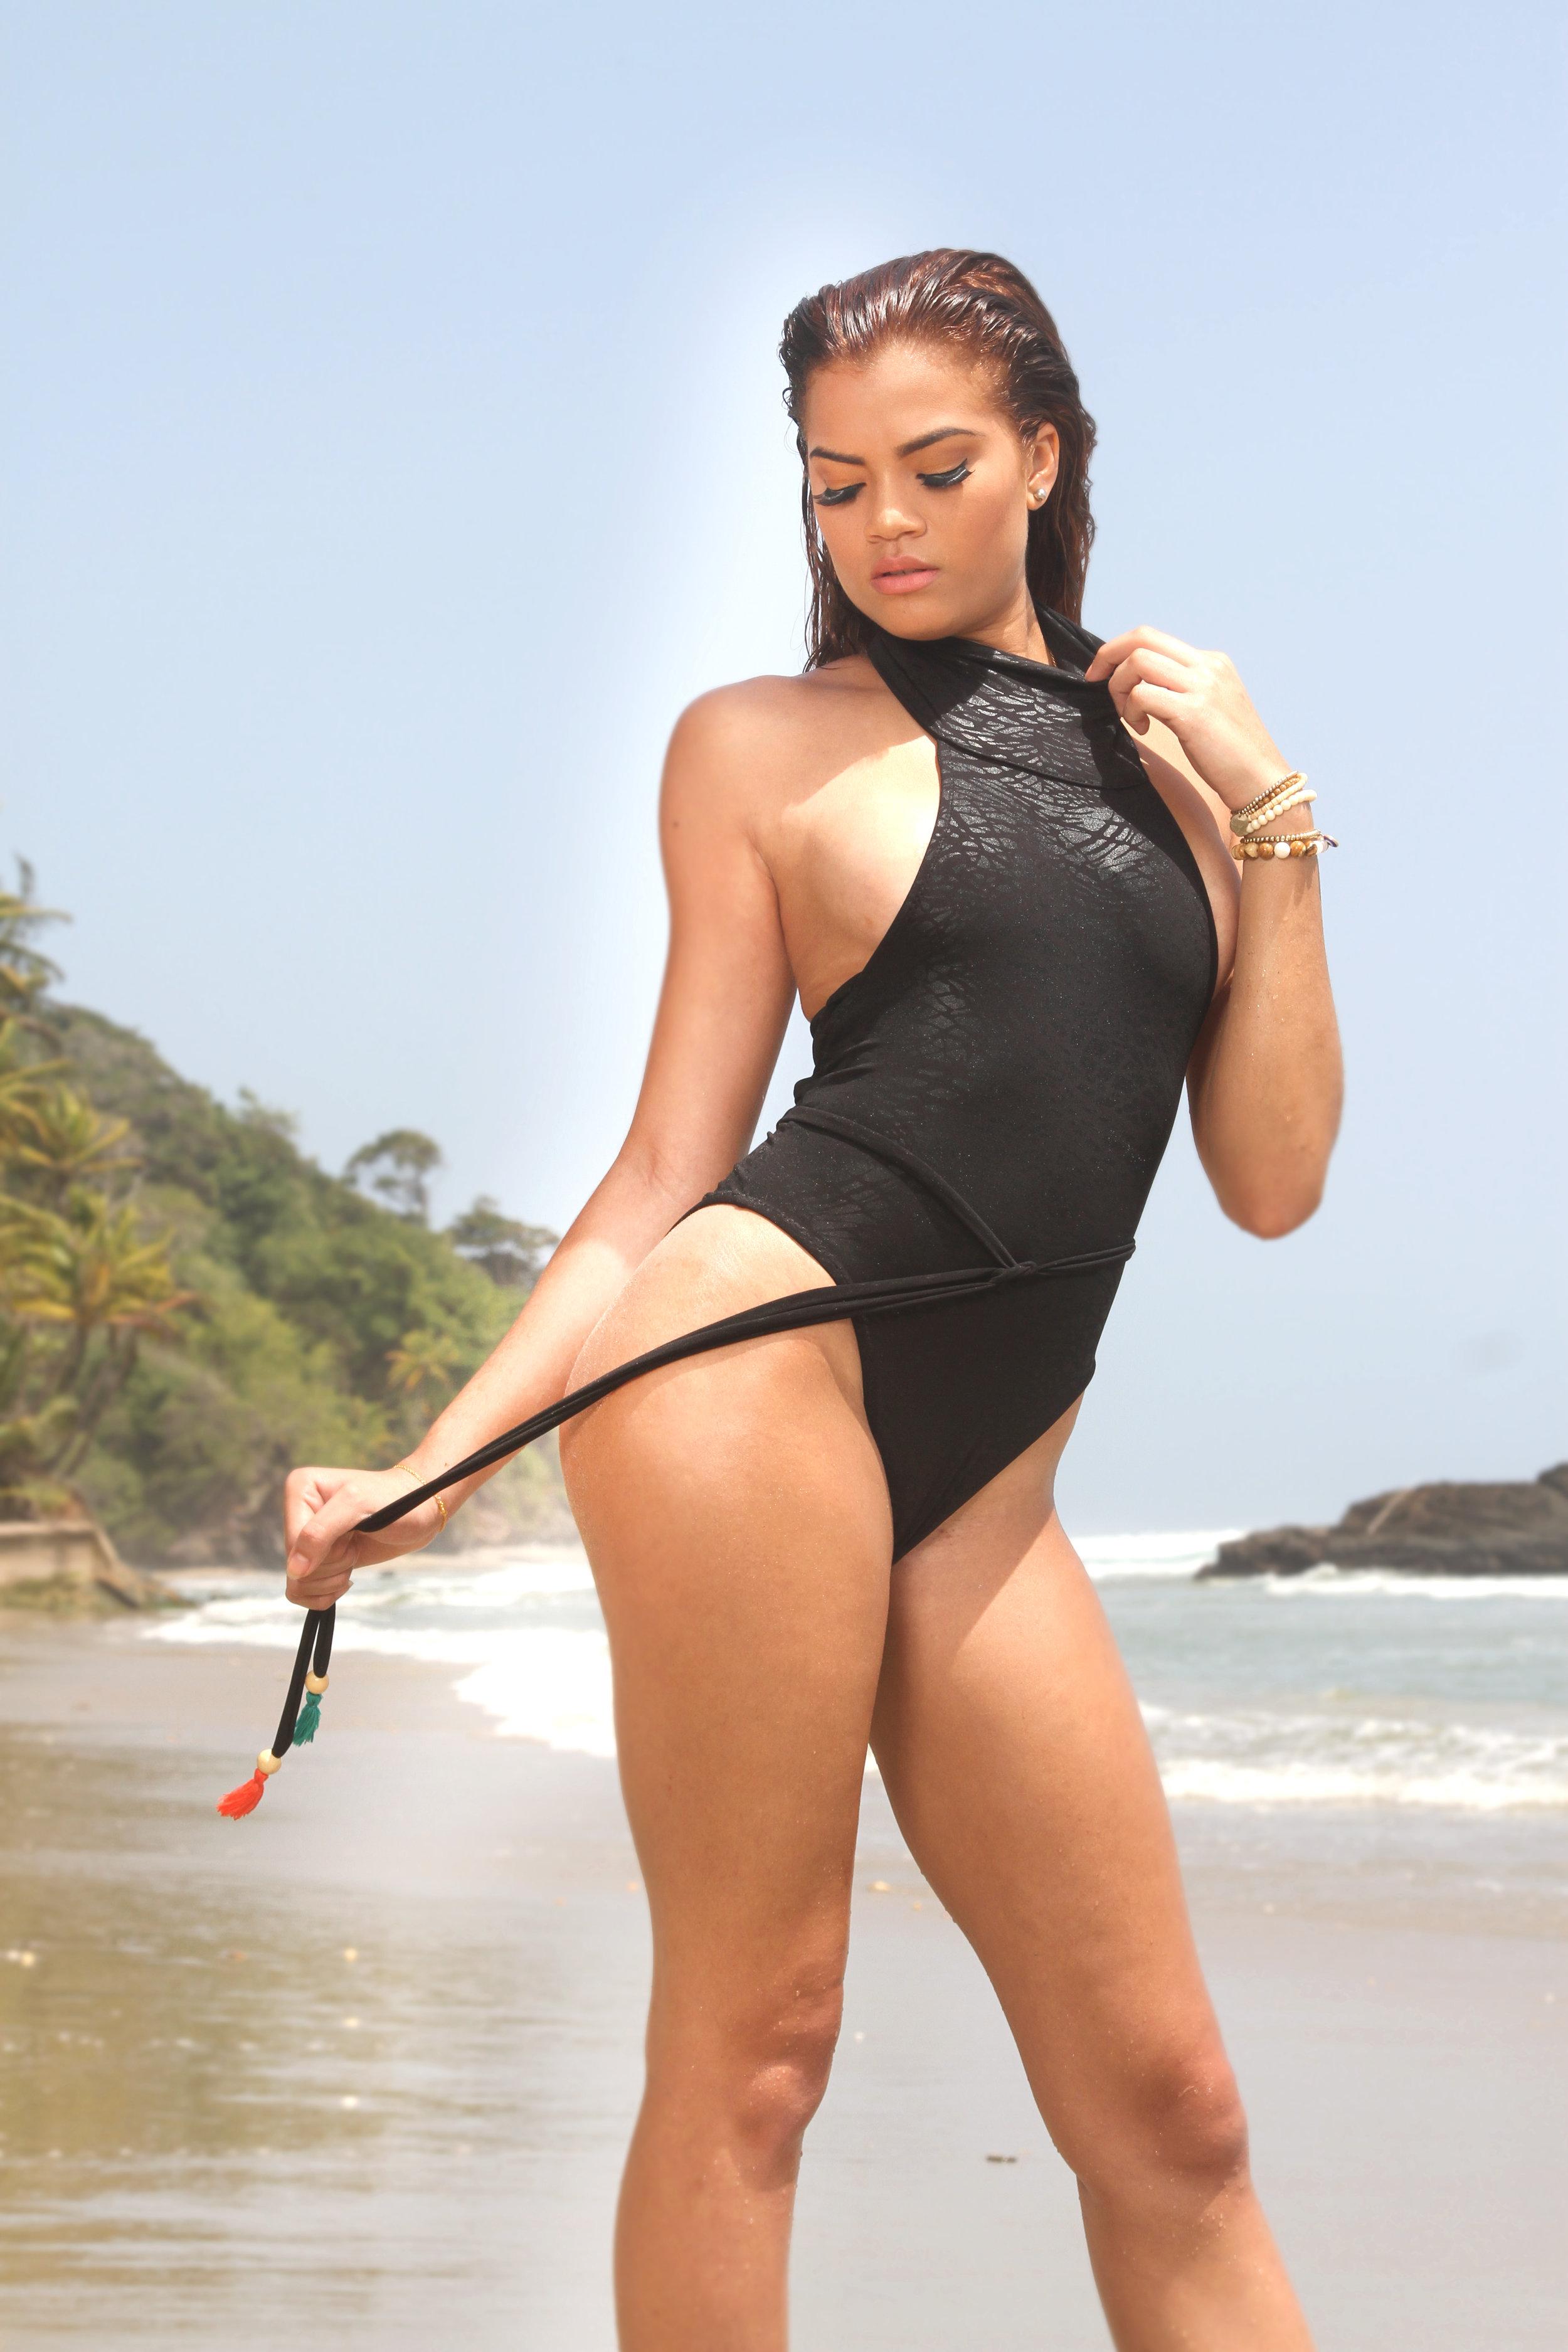 Danielle Bernard